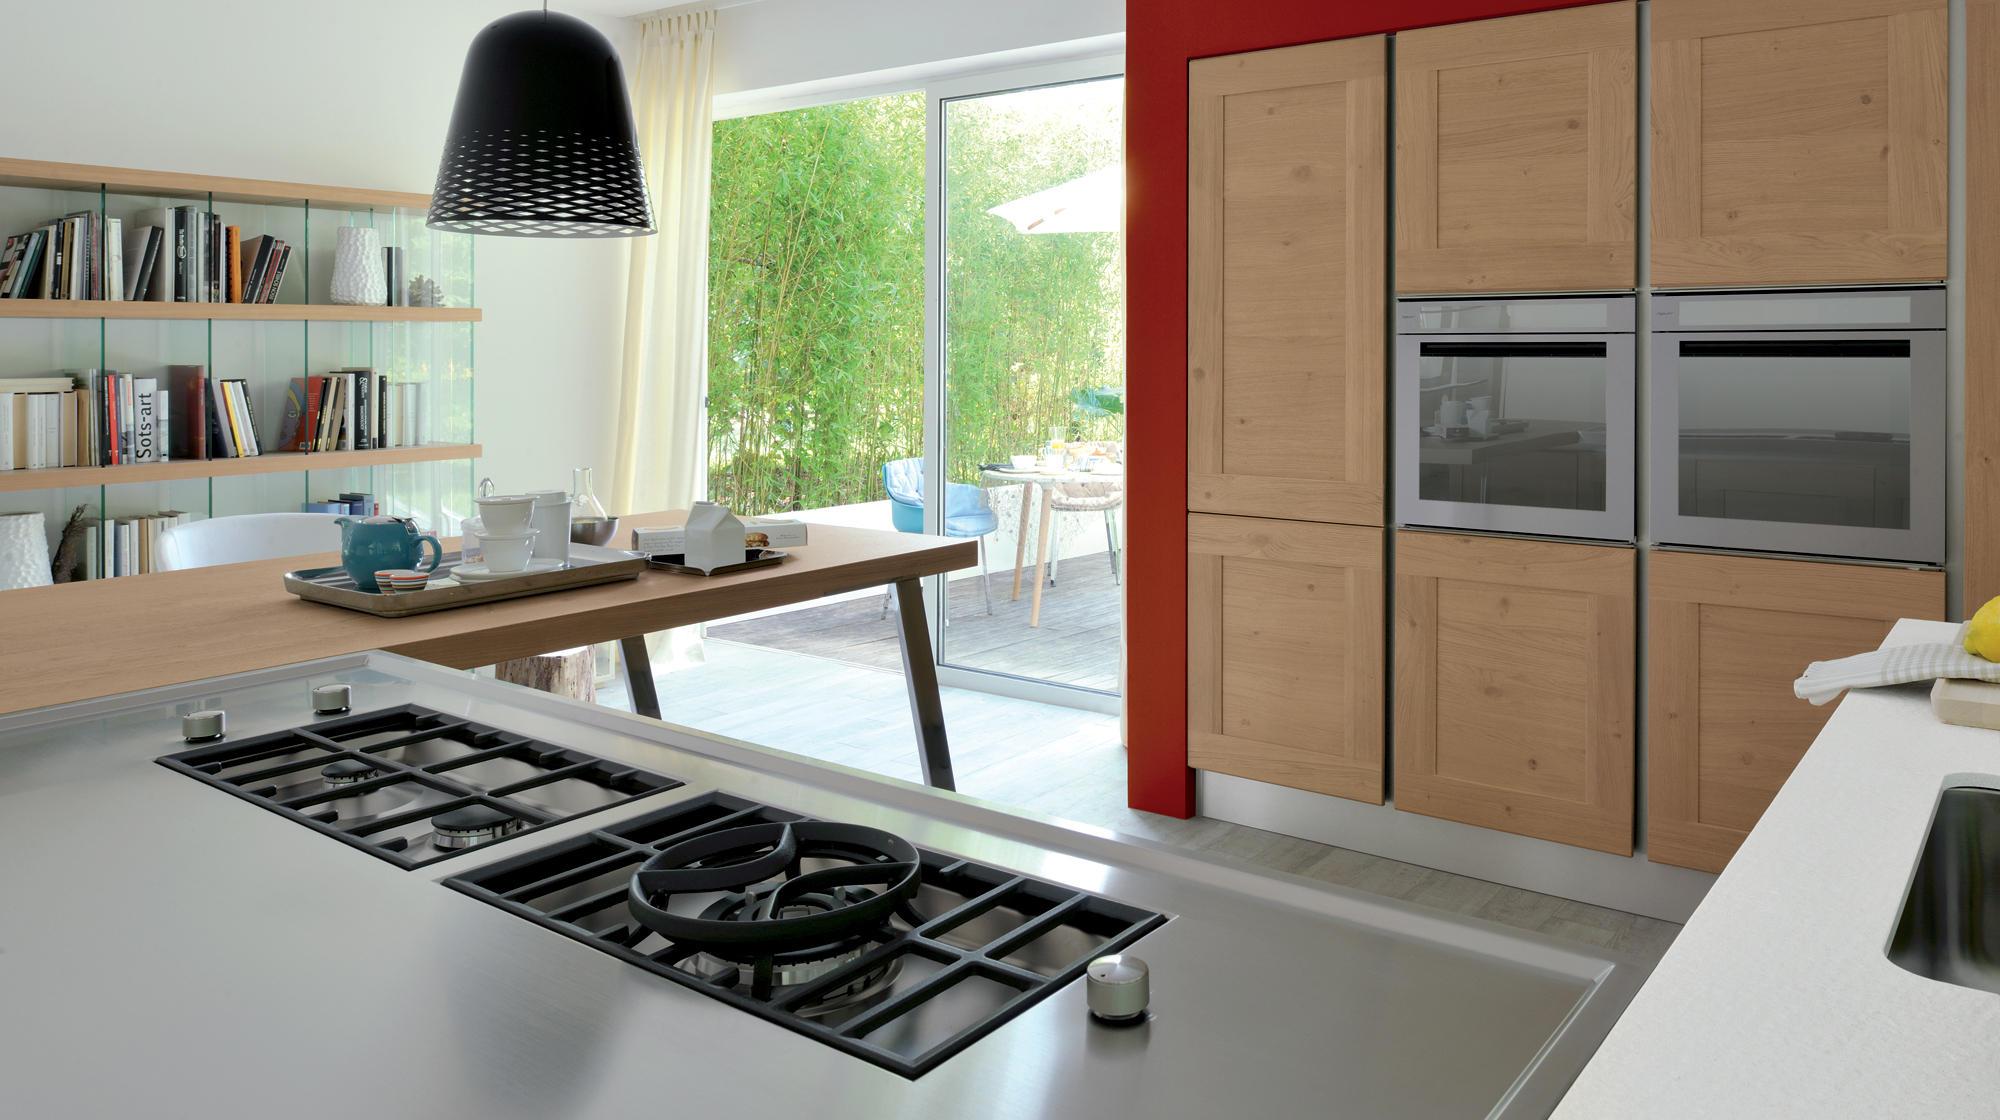 dialogo shellsystem cucine a isola veneta cucine architonic. Black Bedroom Furniture Sets. Home Design Ideas